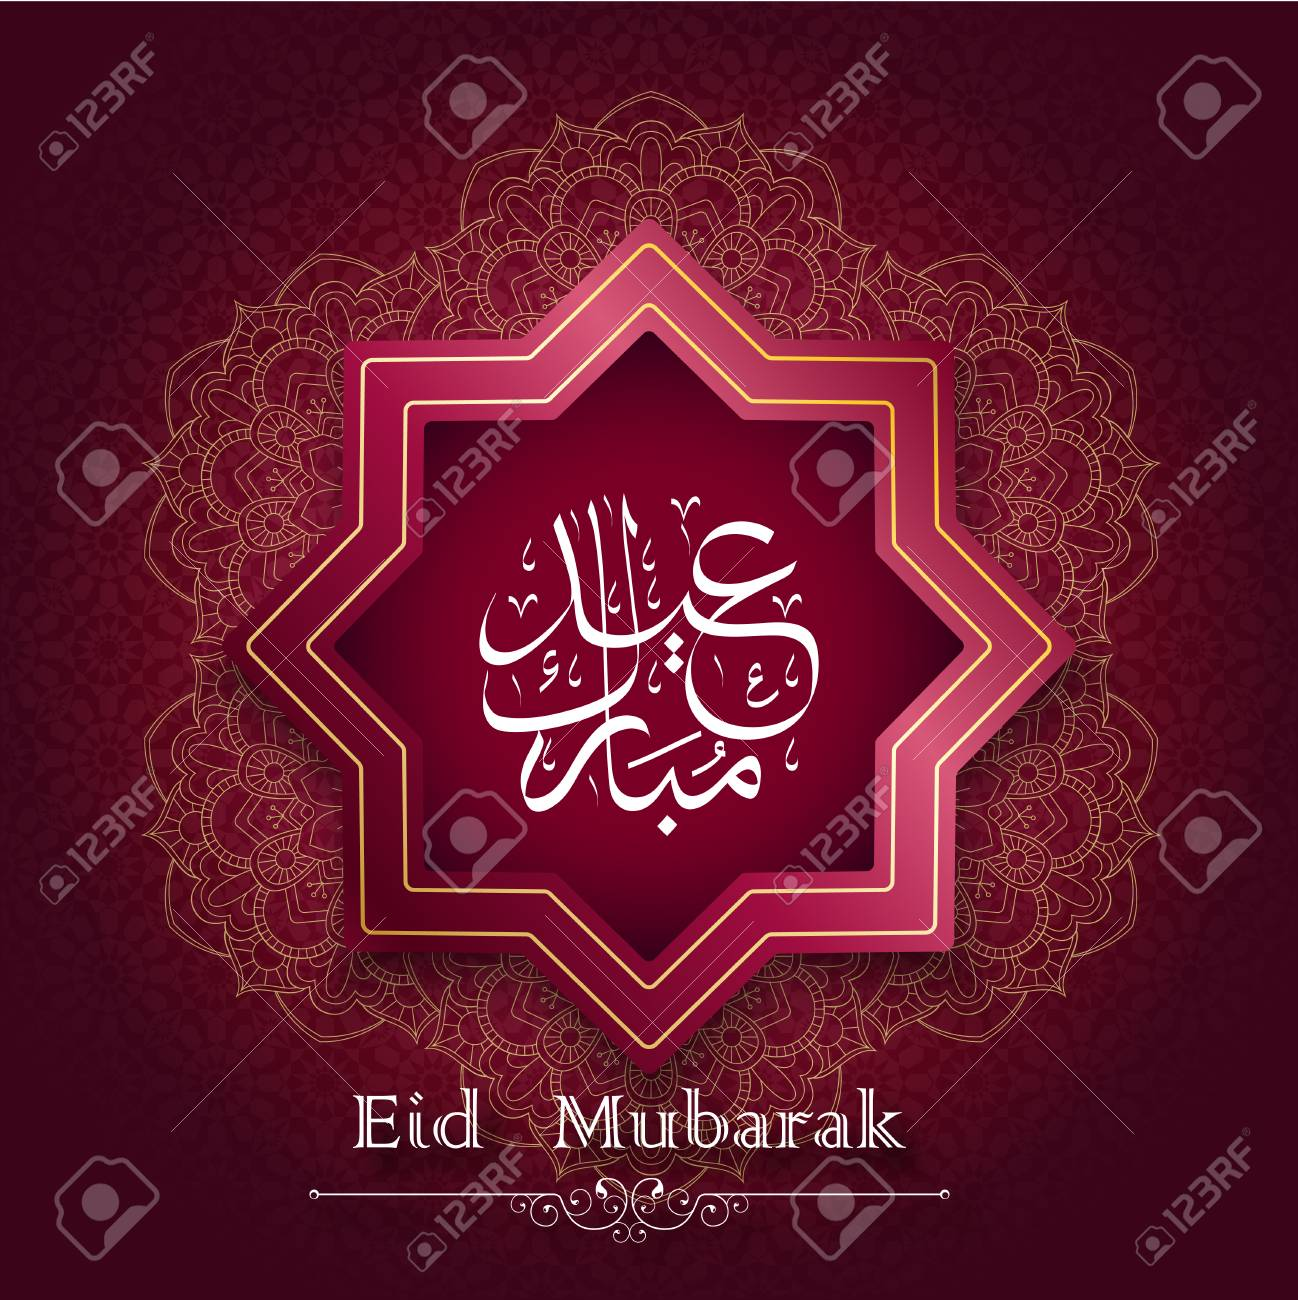 Islamic greeting card eid mubarak with arabic calligraphy royalty islamic greeting card eid mubarak with arabic calligraphy stock vector 102832171 m4hsunfo